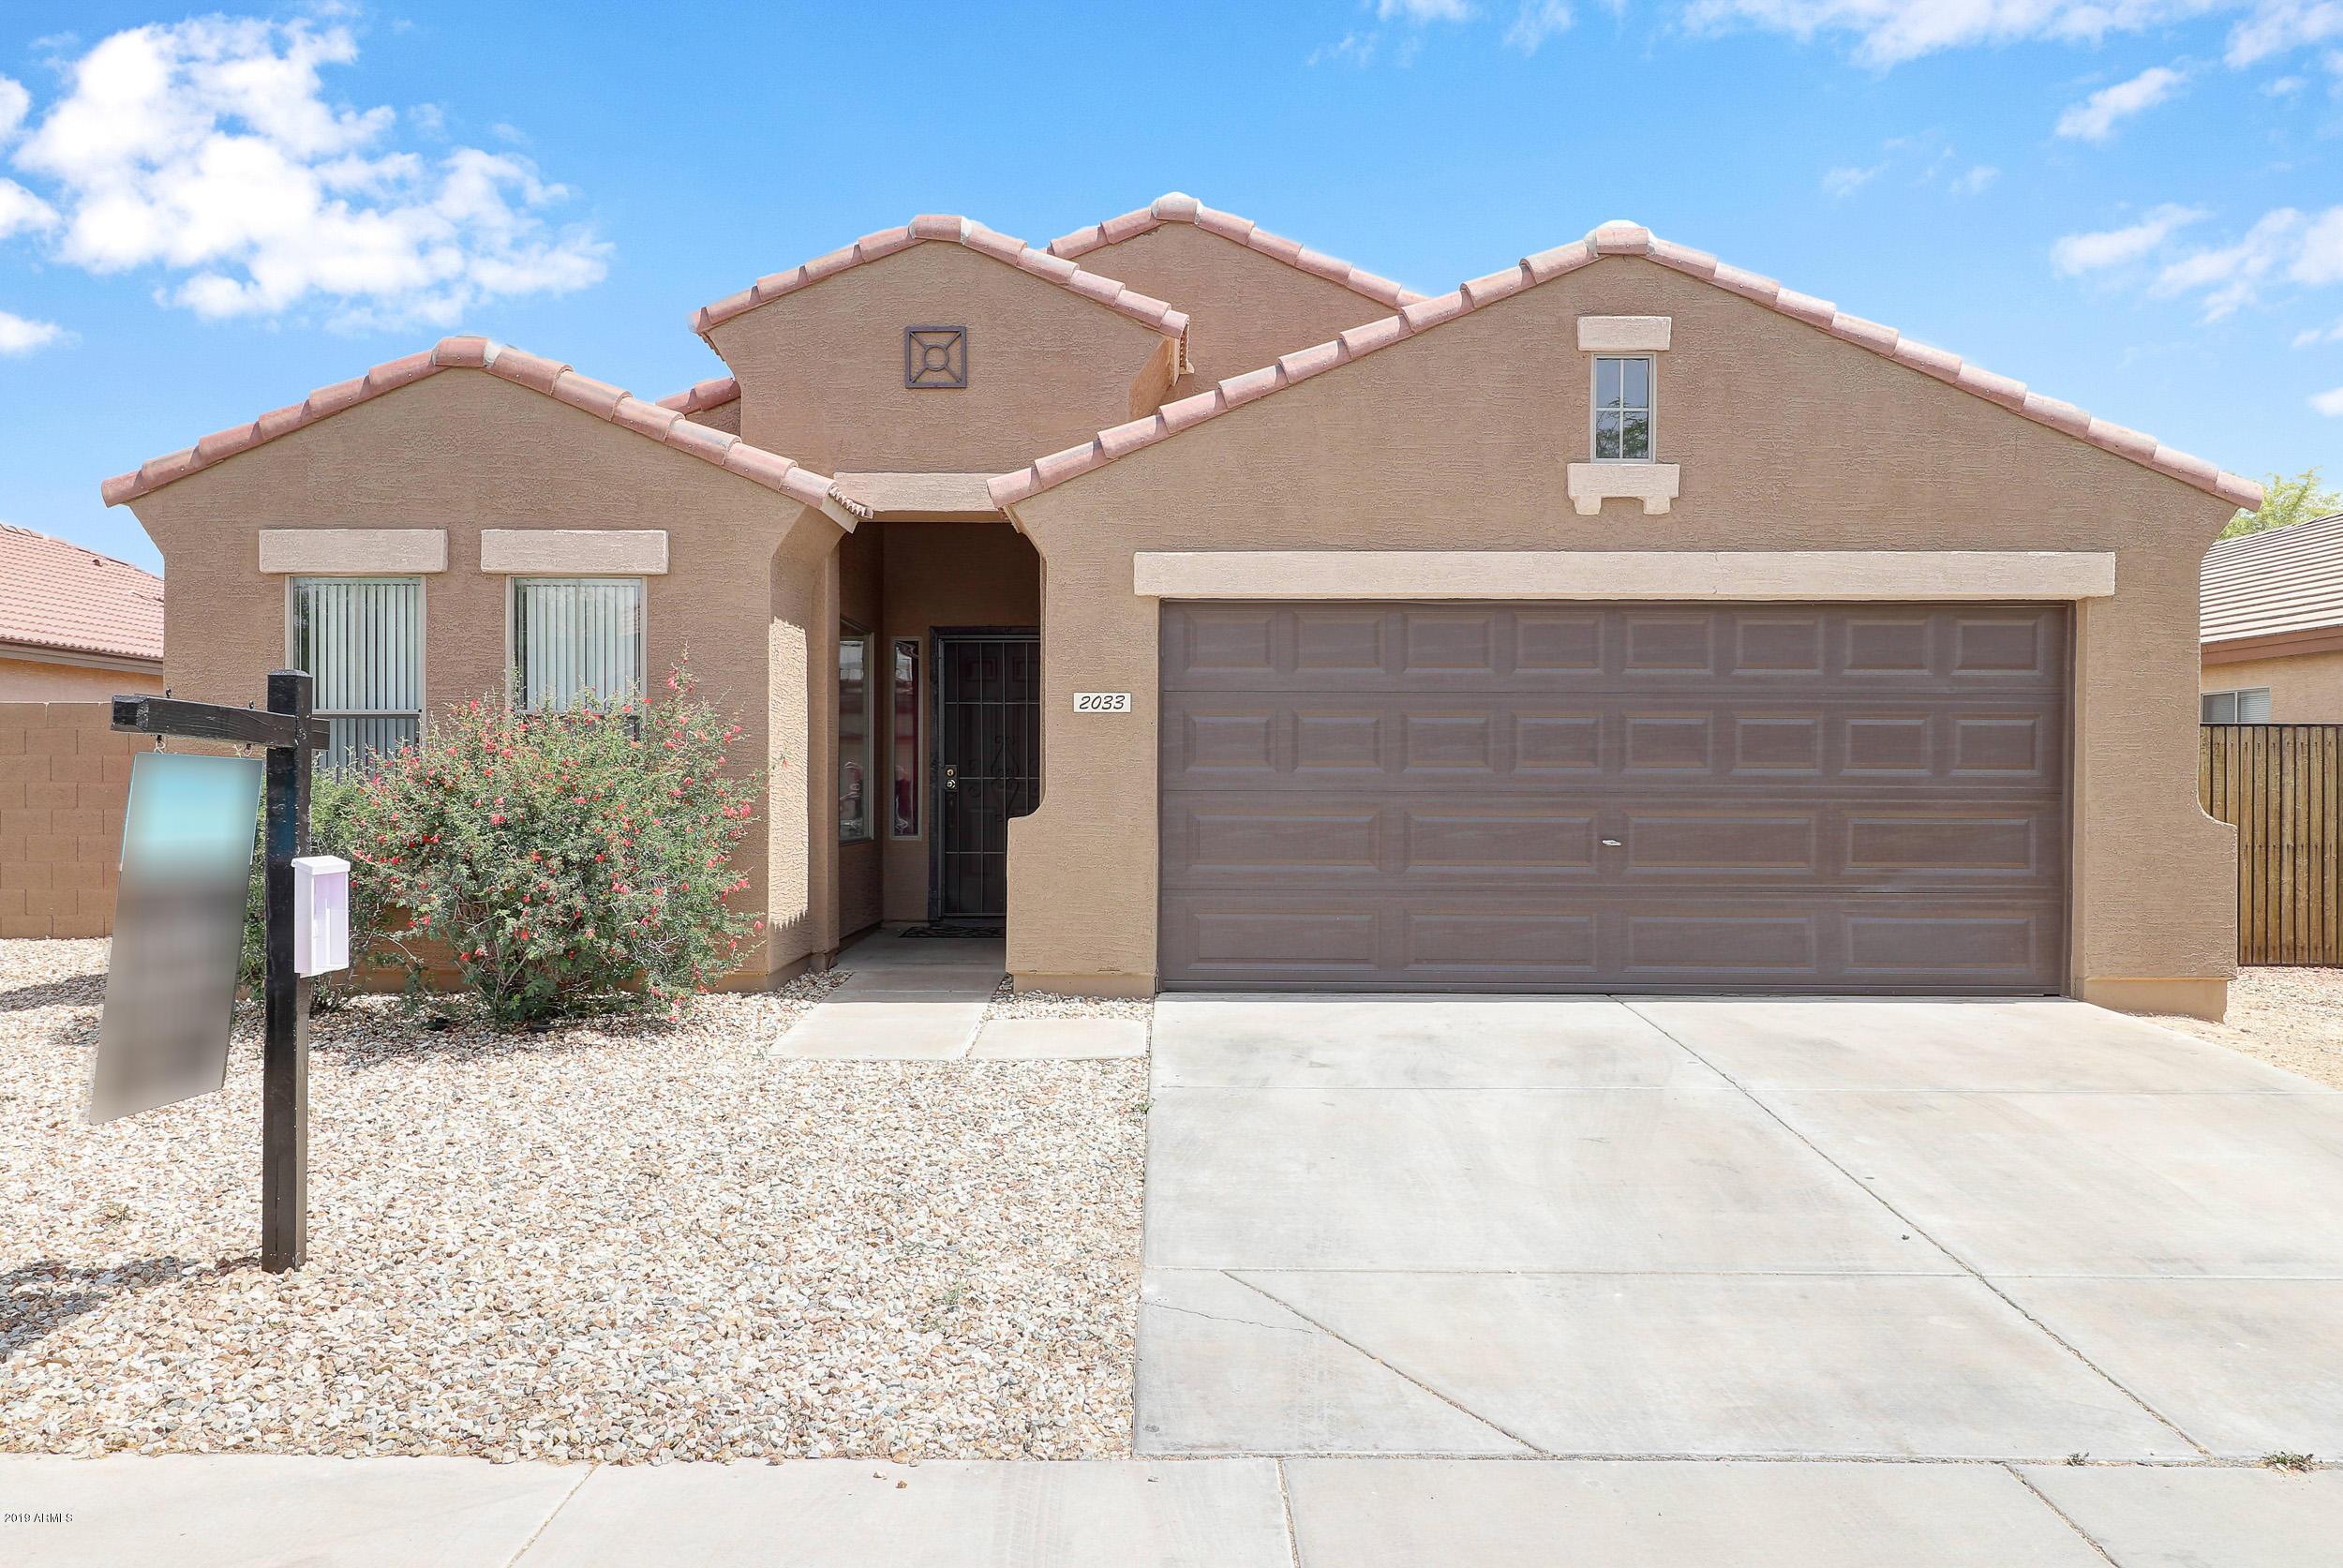 Photo of 2033 S 86TH Avenue, Tolleson, AZ 85353